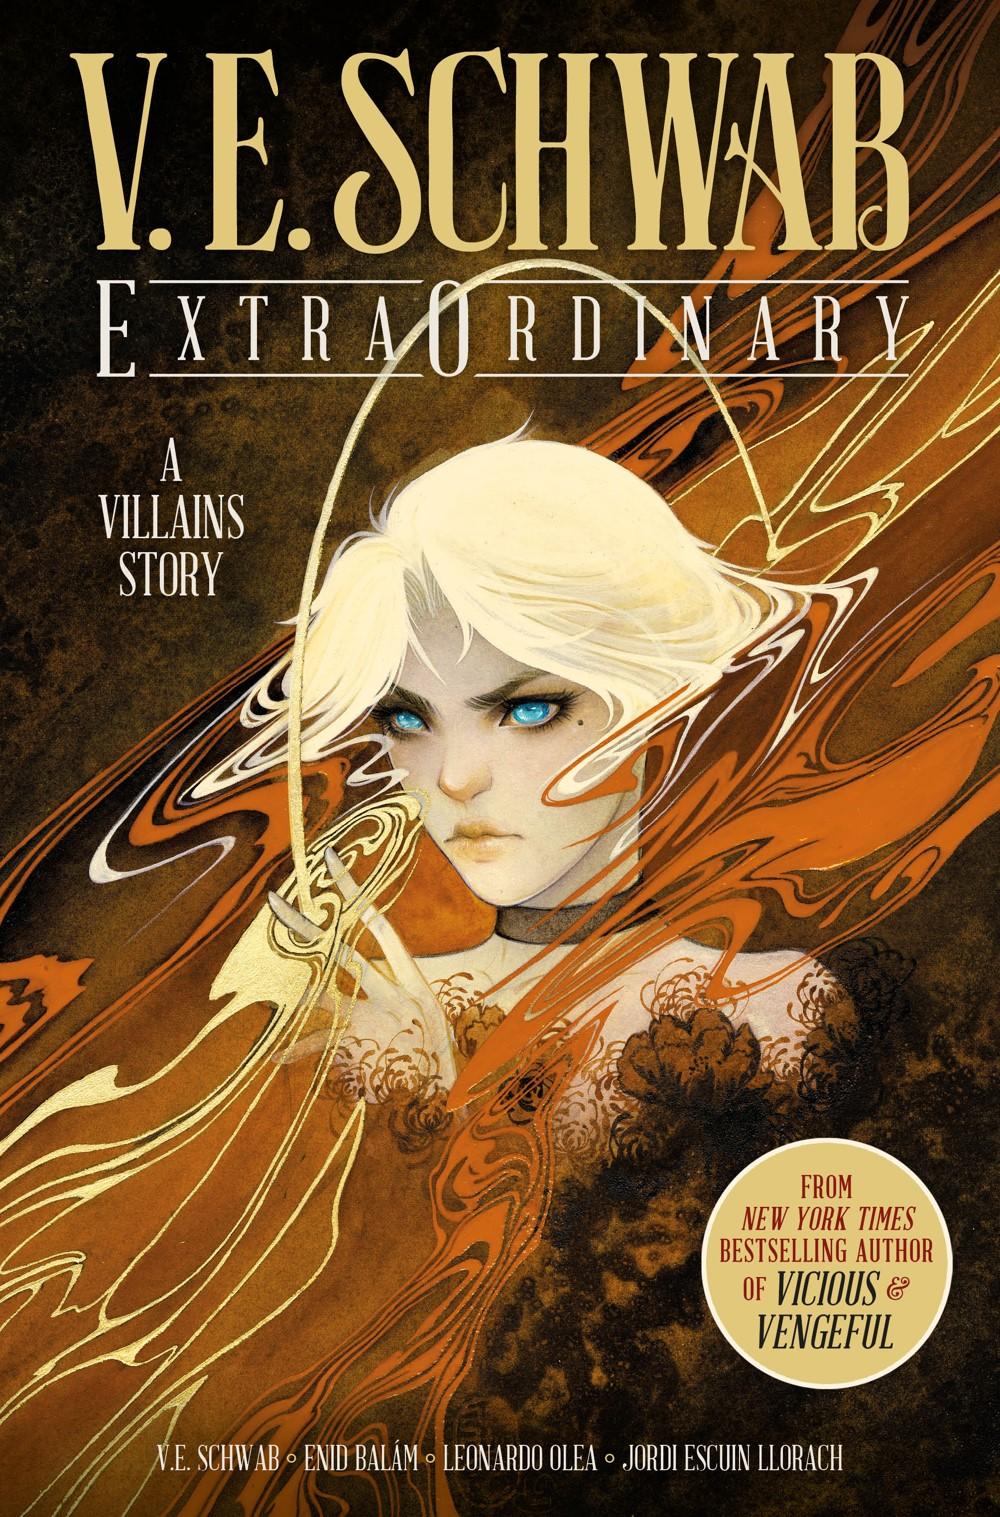 EXTRAORDINARY-HC-SIGNED-EDITION Titan Comics October 2021 Solicitations